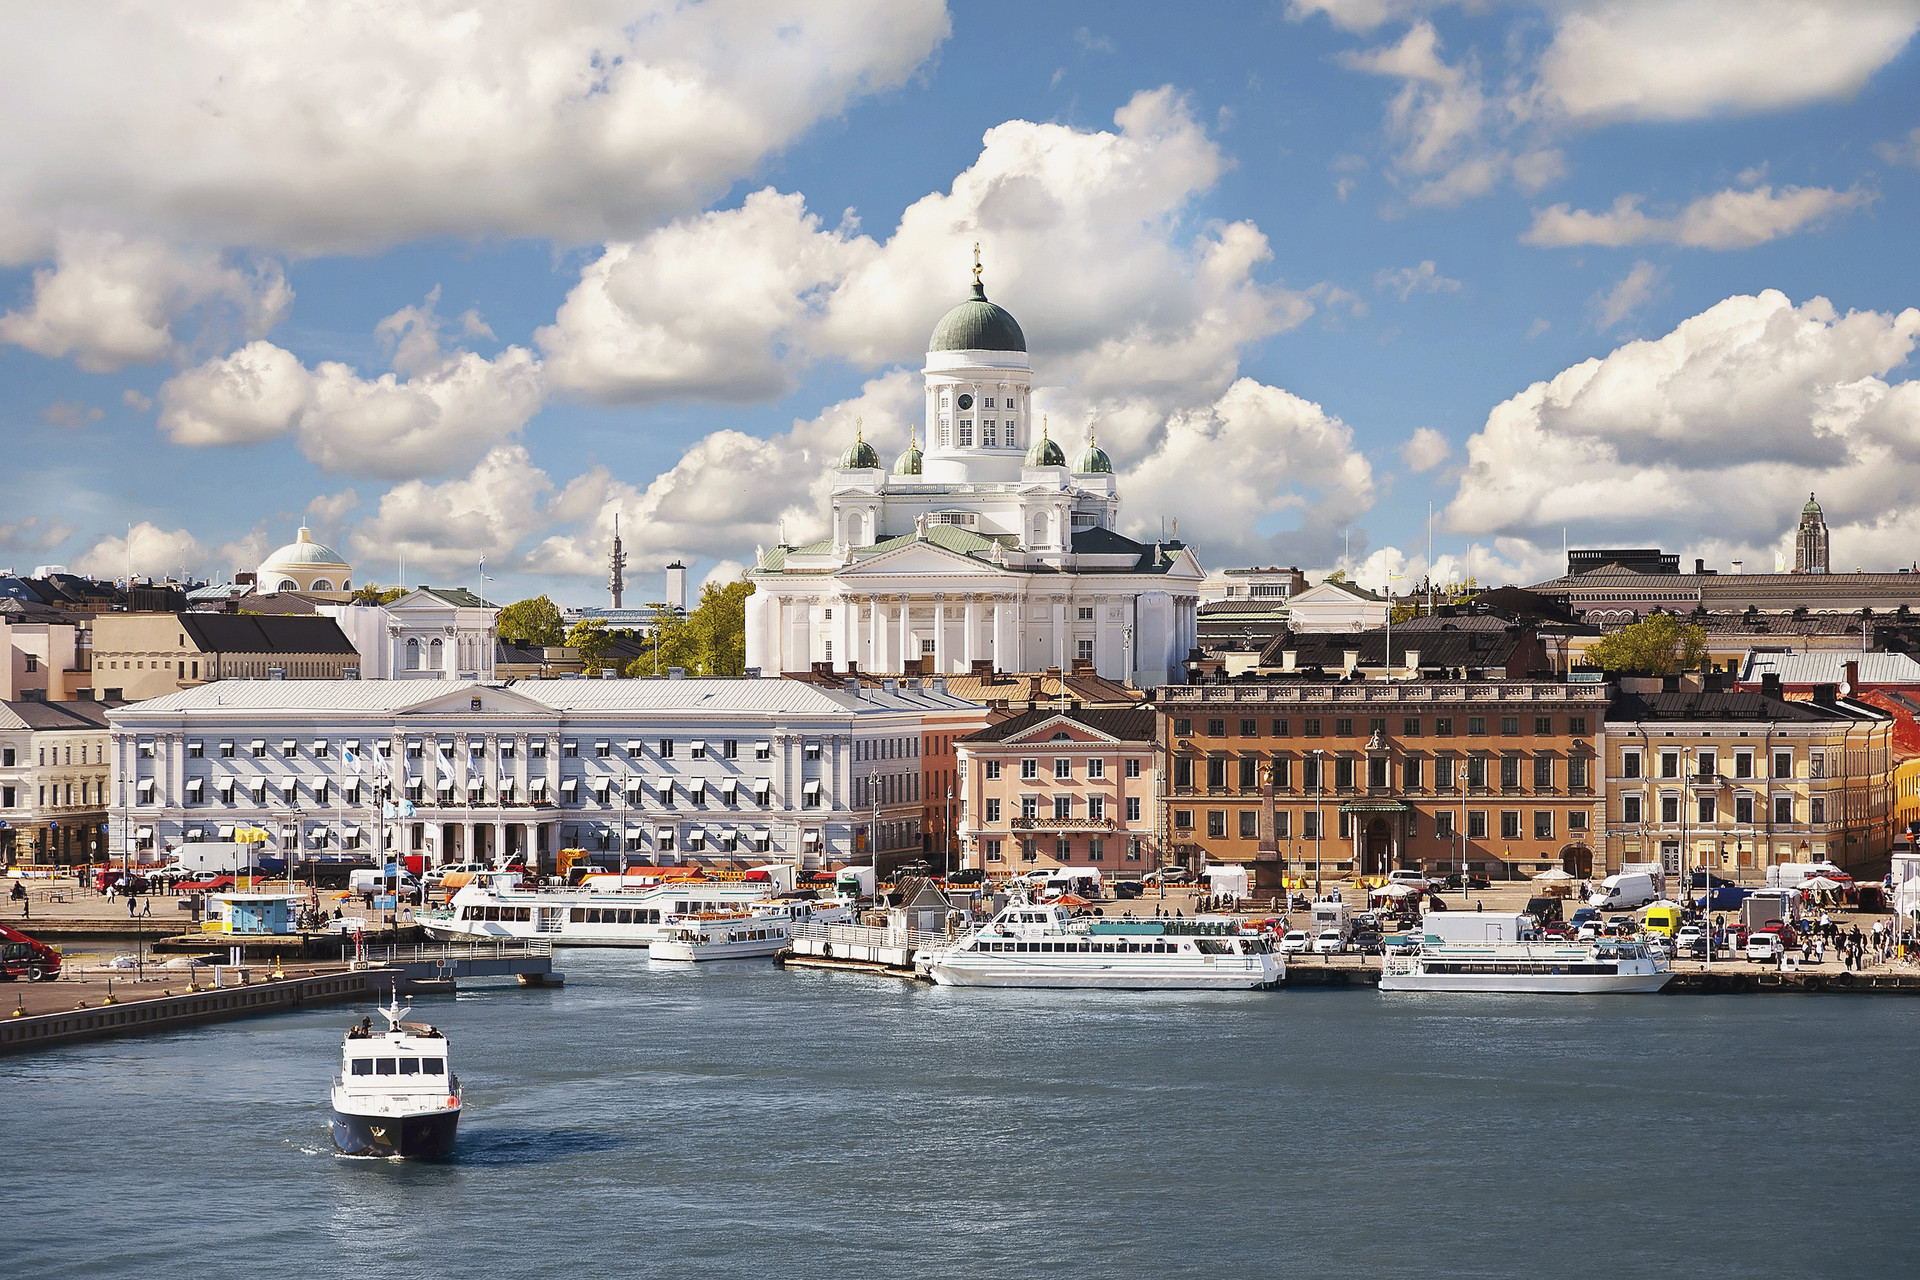 Esperienza a Helsinki, Finlandia, di Linnea